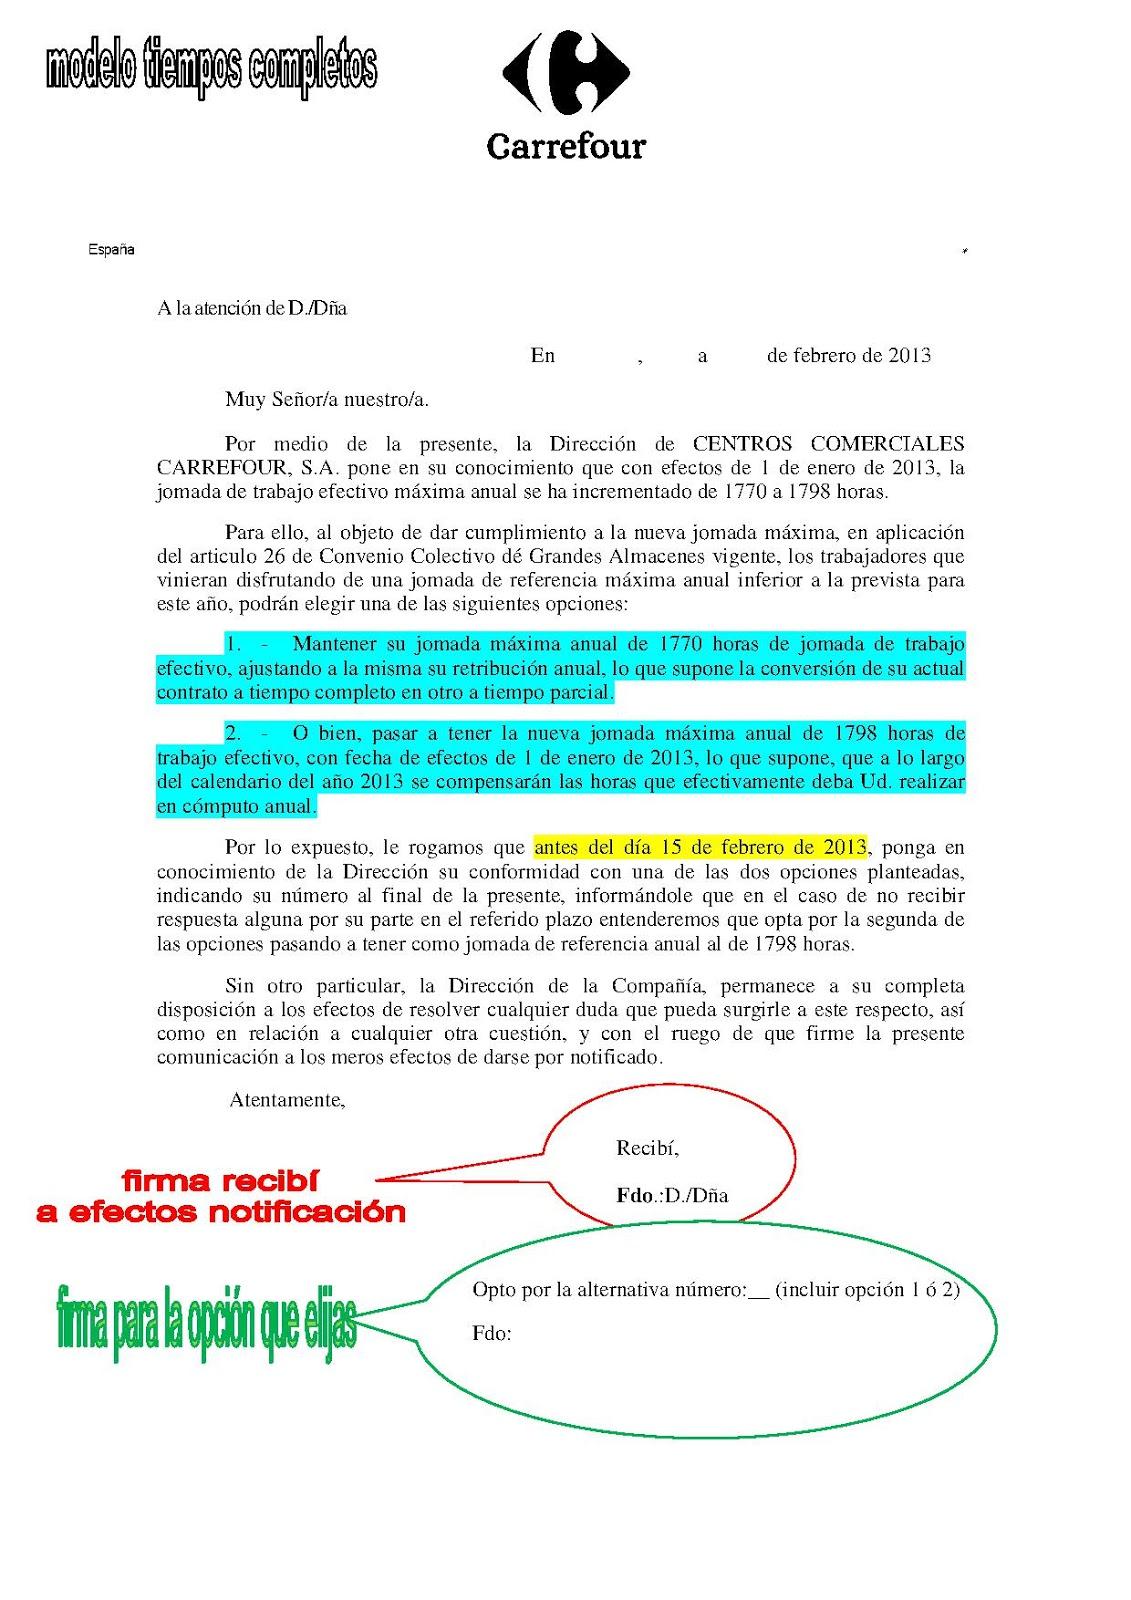 Carrefour Ugt Modelos De Carta Para Adecuaci N De Jornada